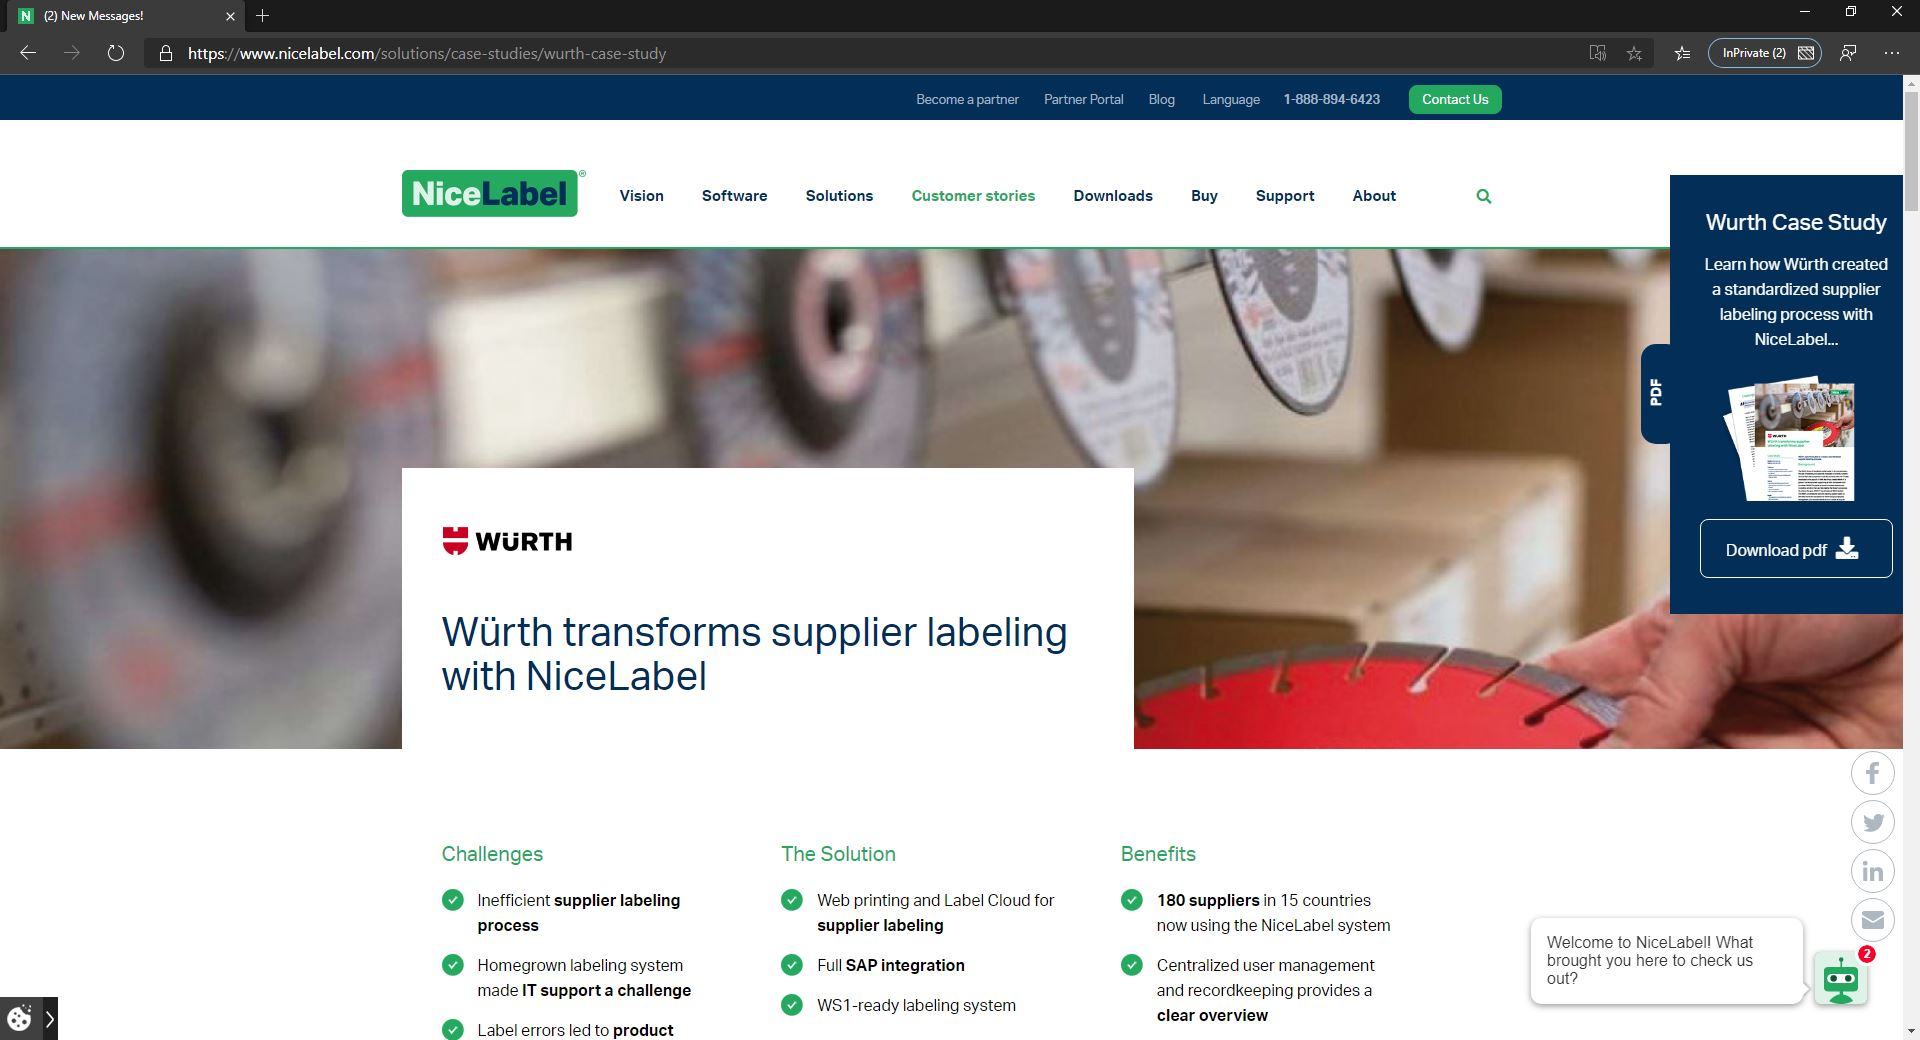 Nicelabel To Transform Supplier Labeling-Fig 1